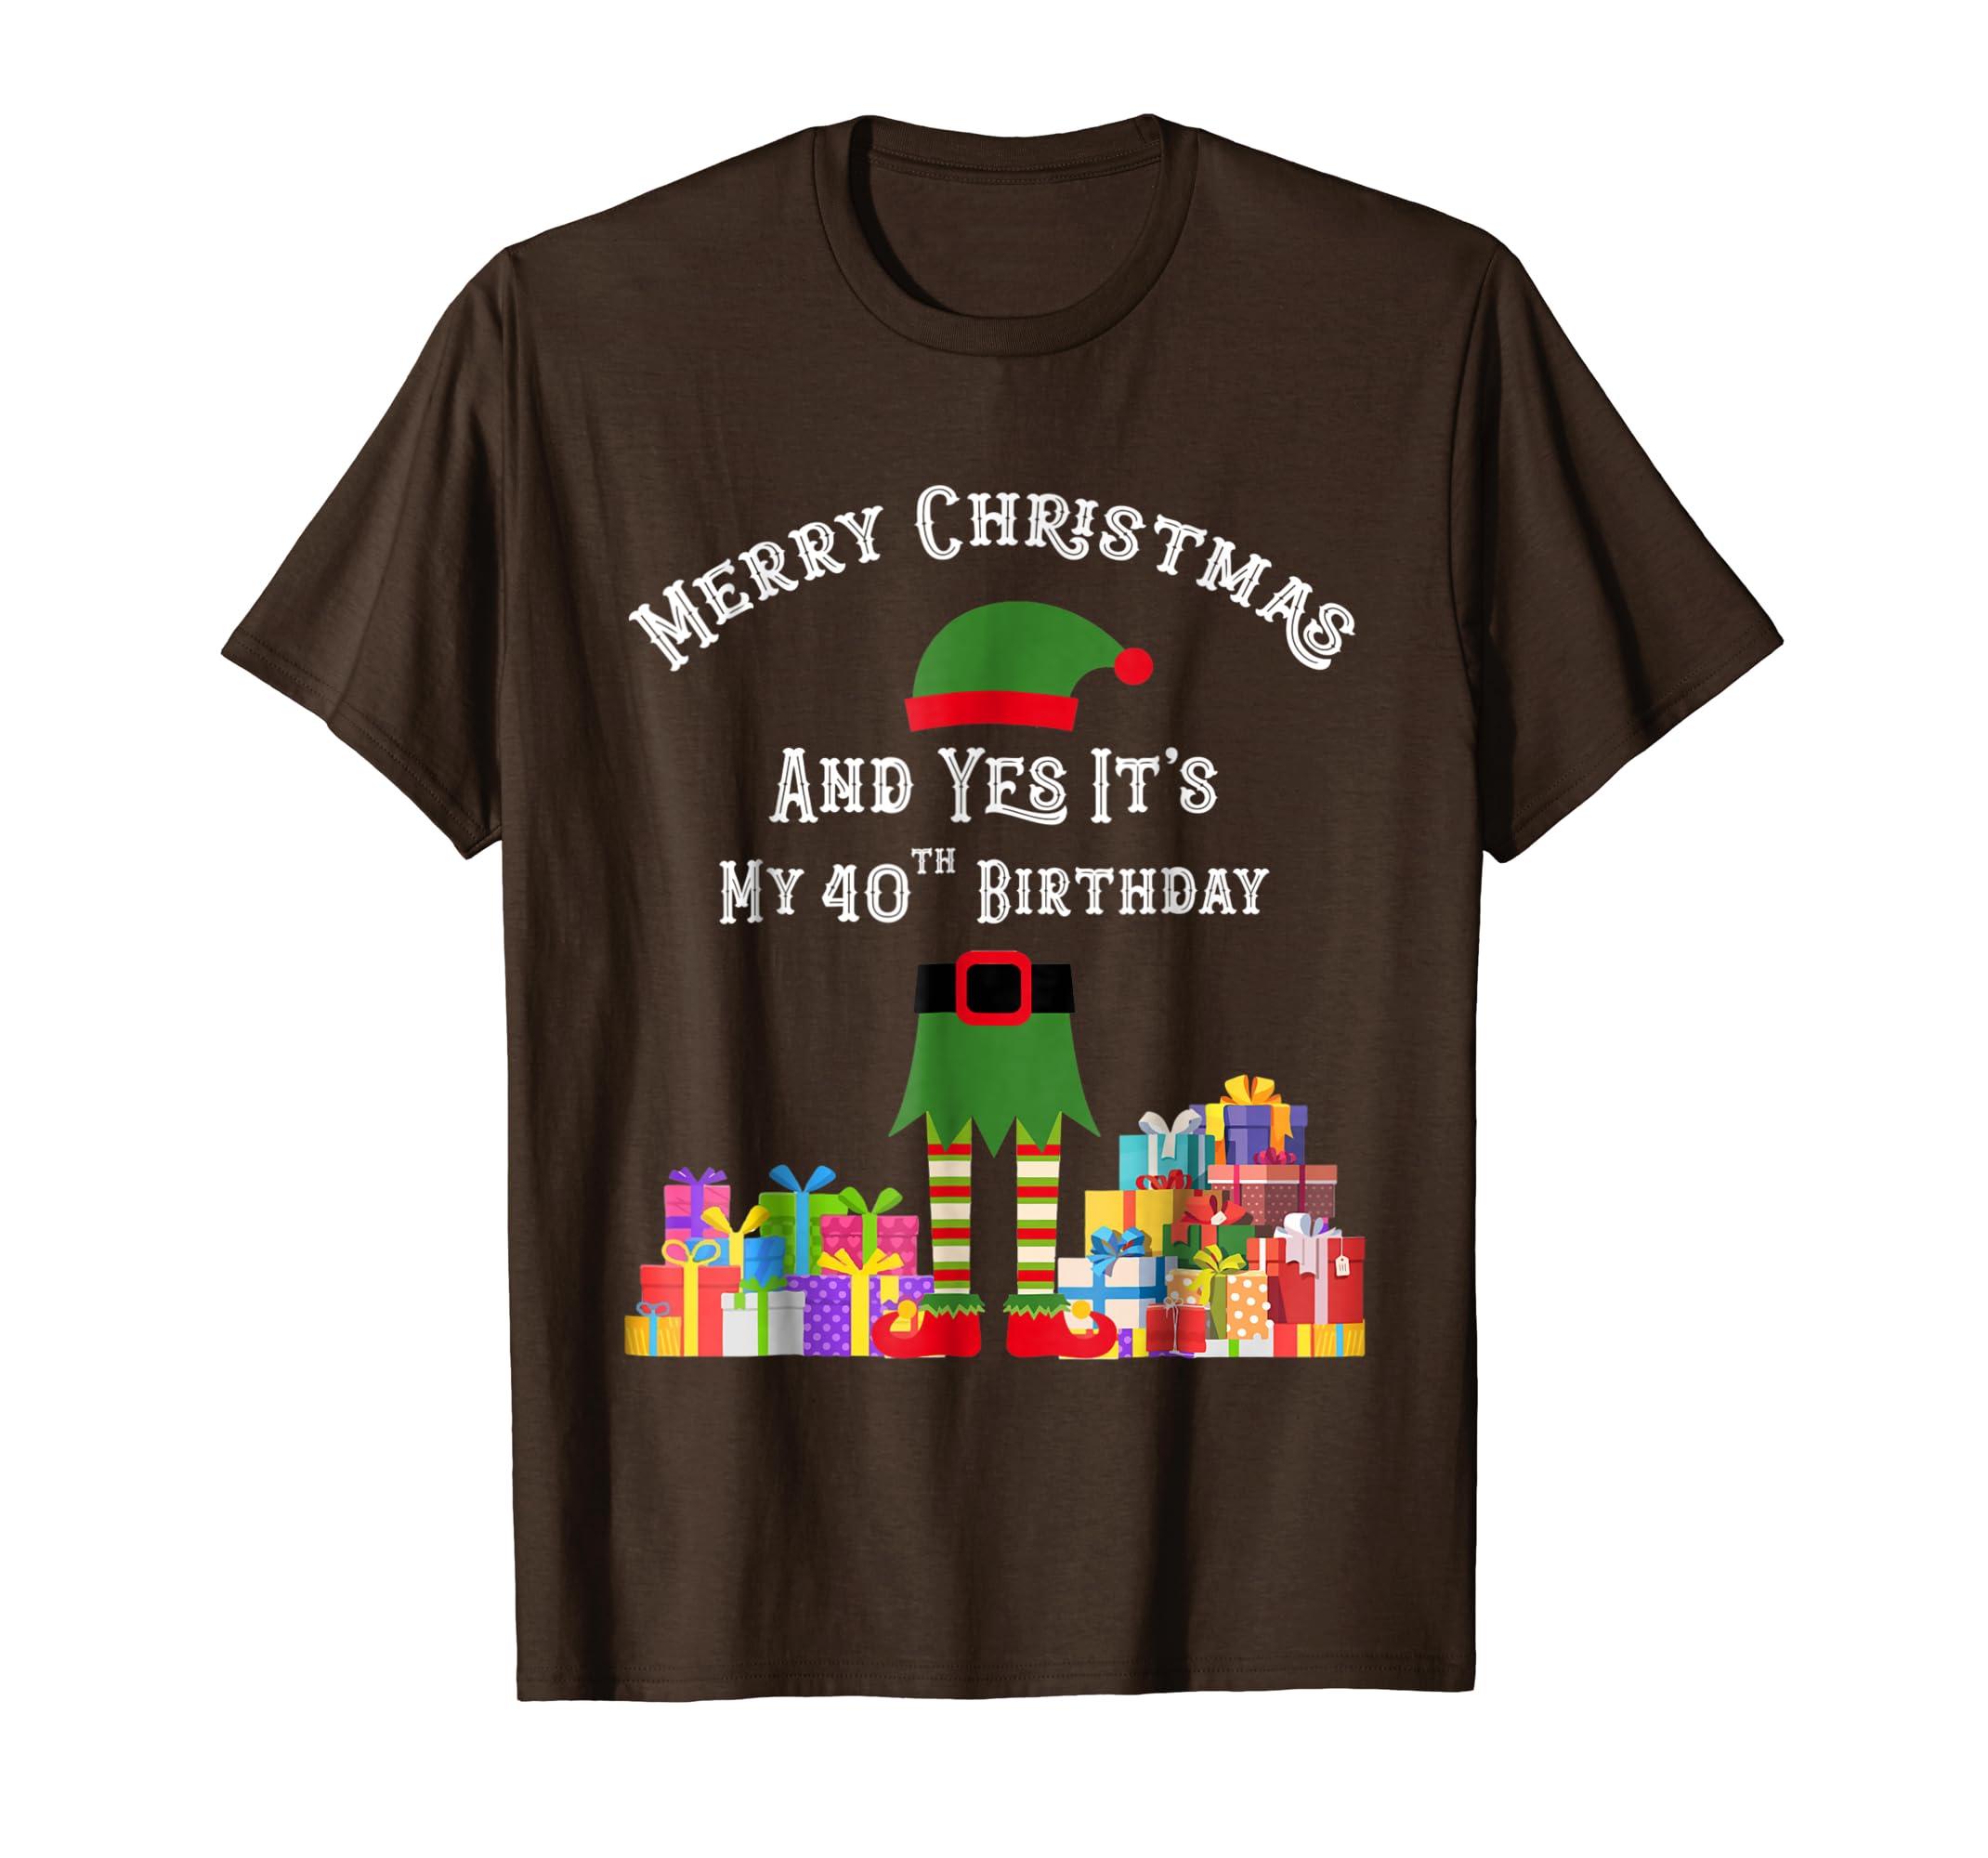 Merry Christmas And Yes, It's My 40th Birthday Elf Tshirt-Teechatpro